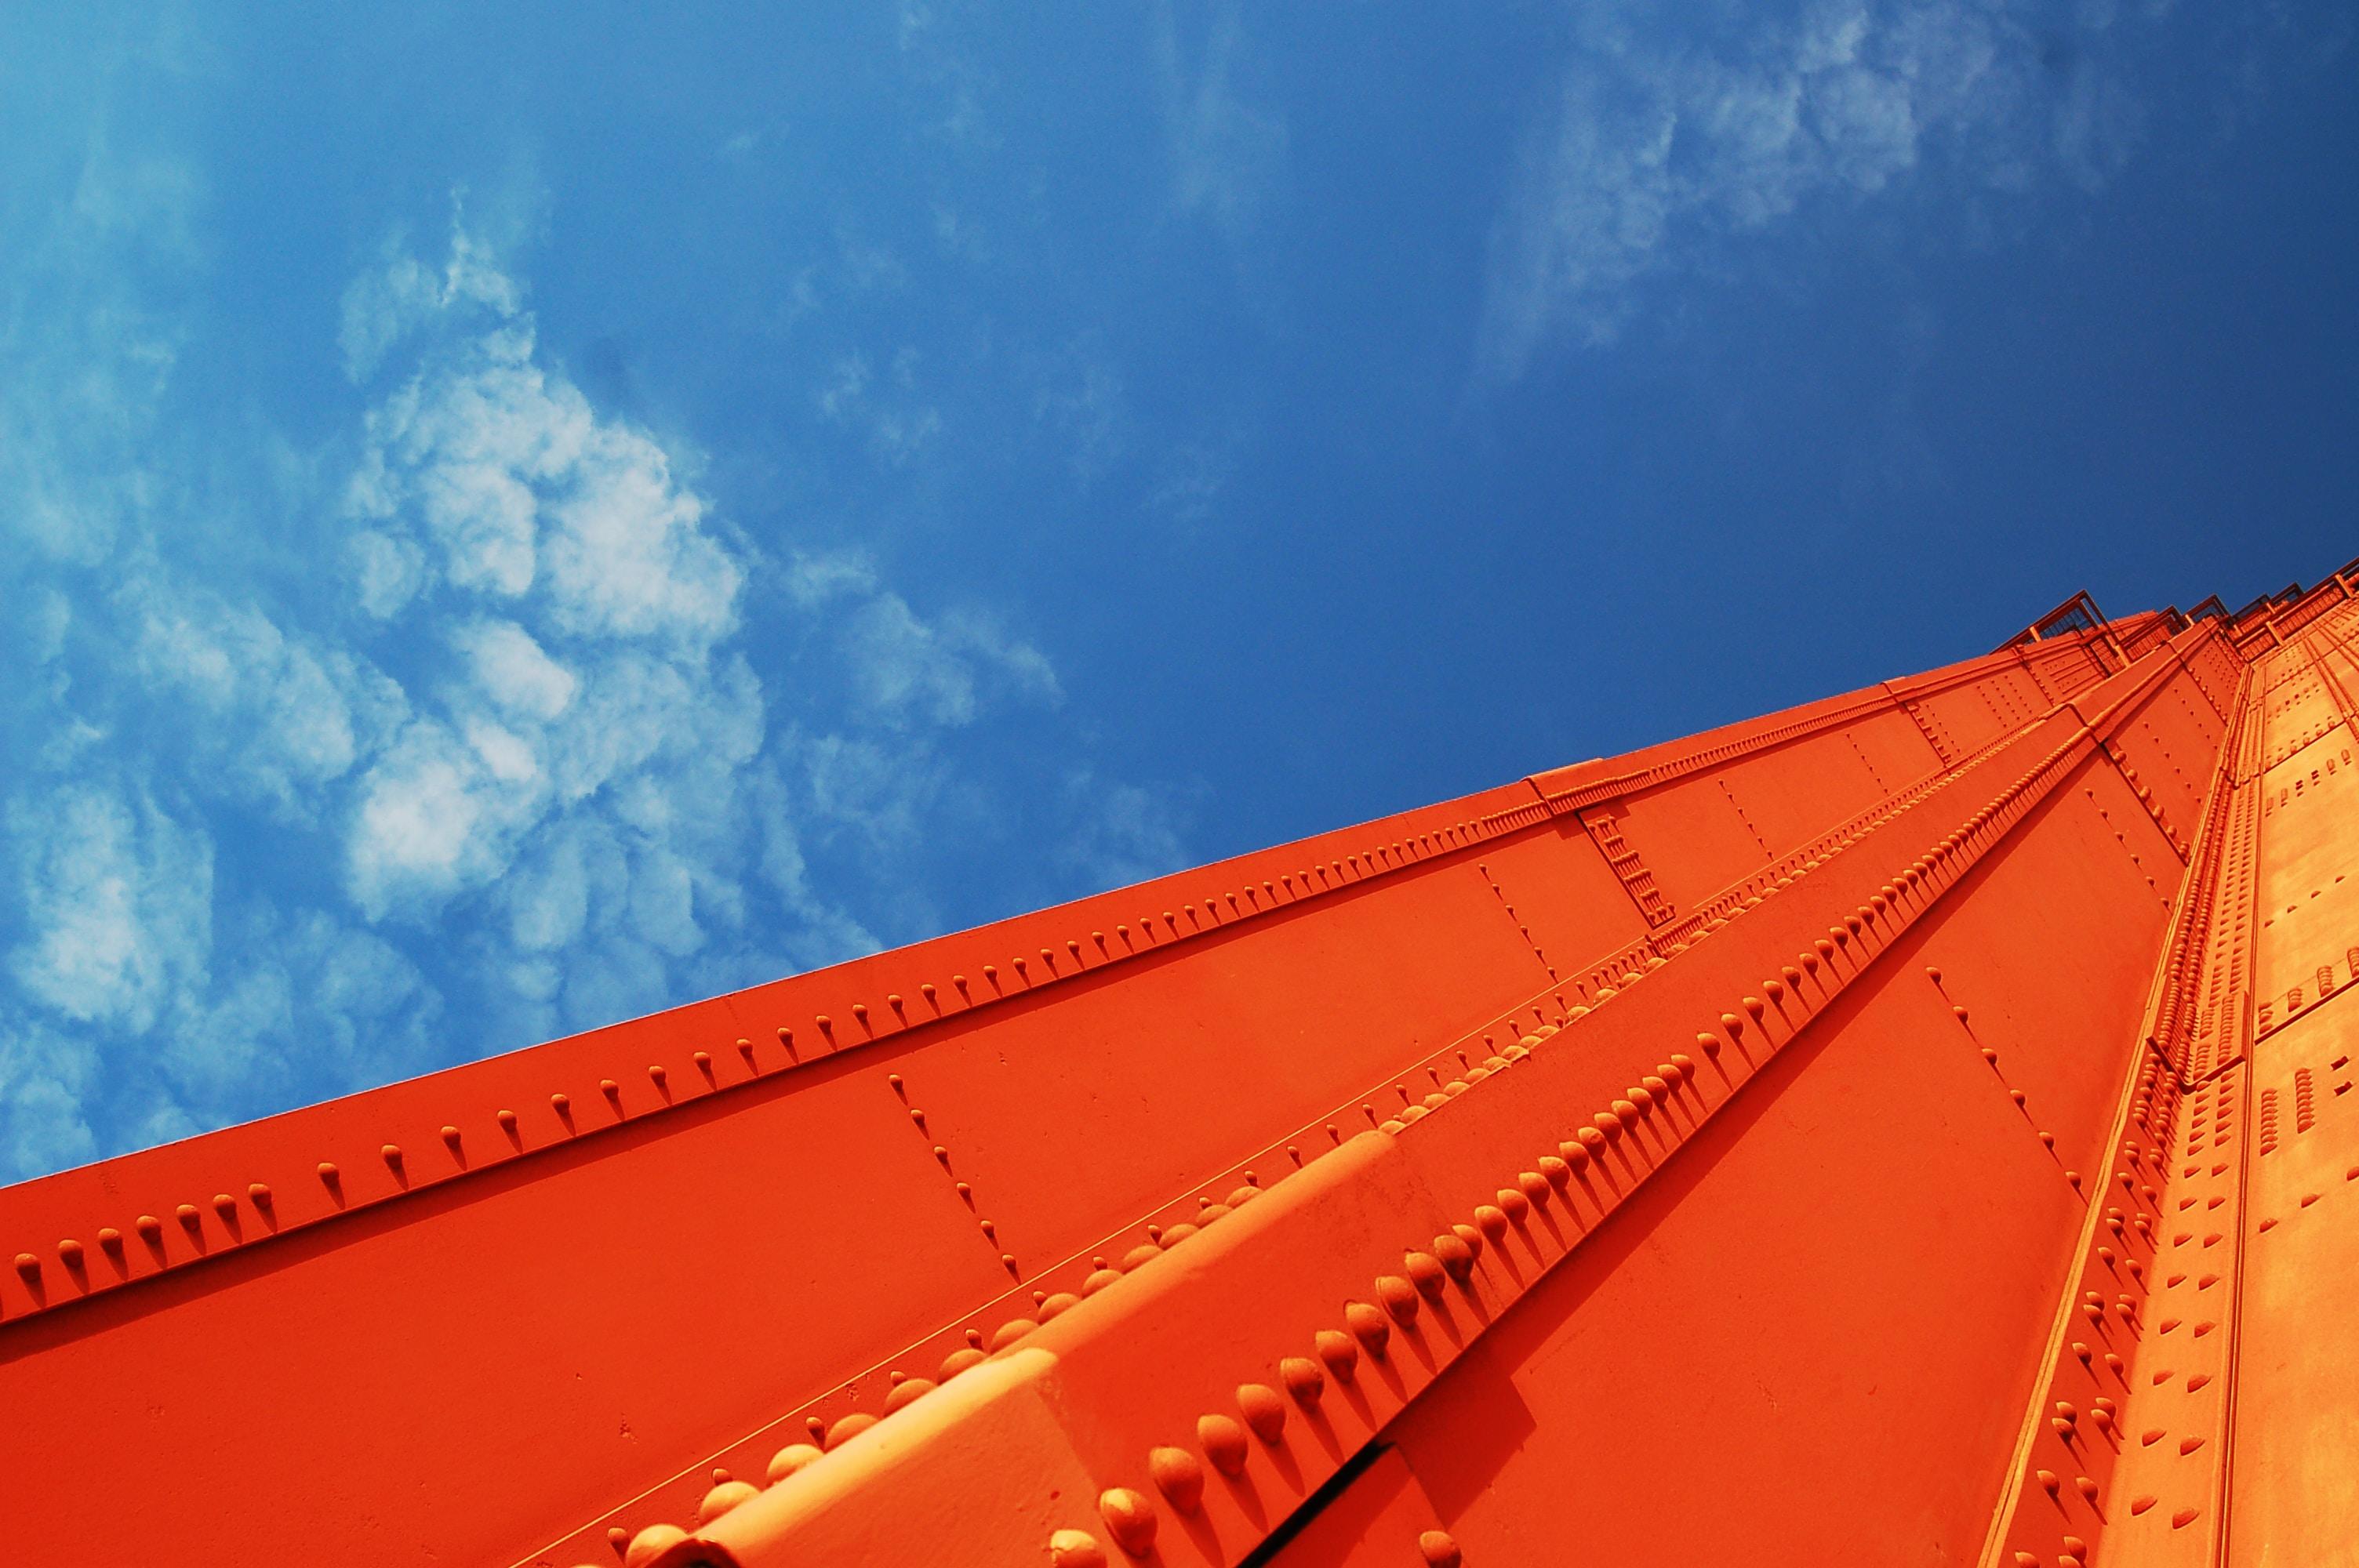 bottom view of orange building